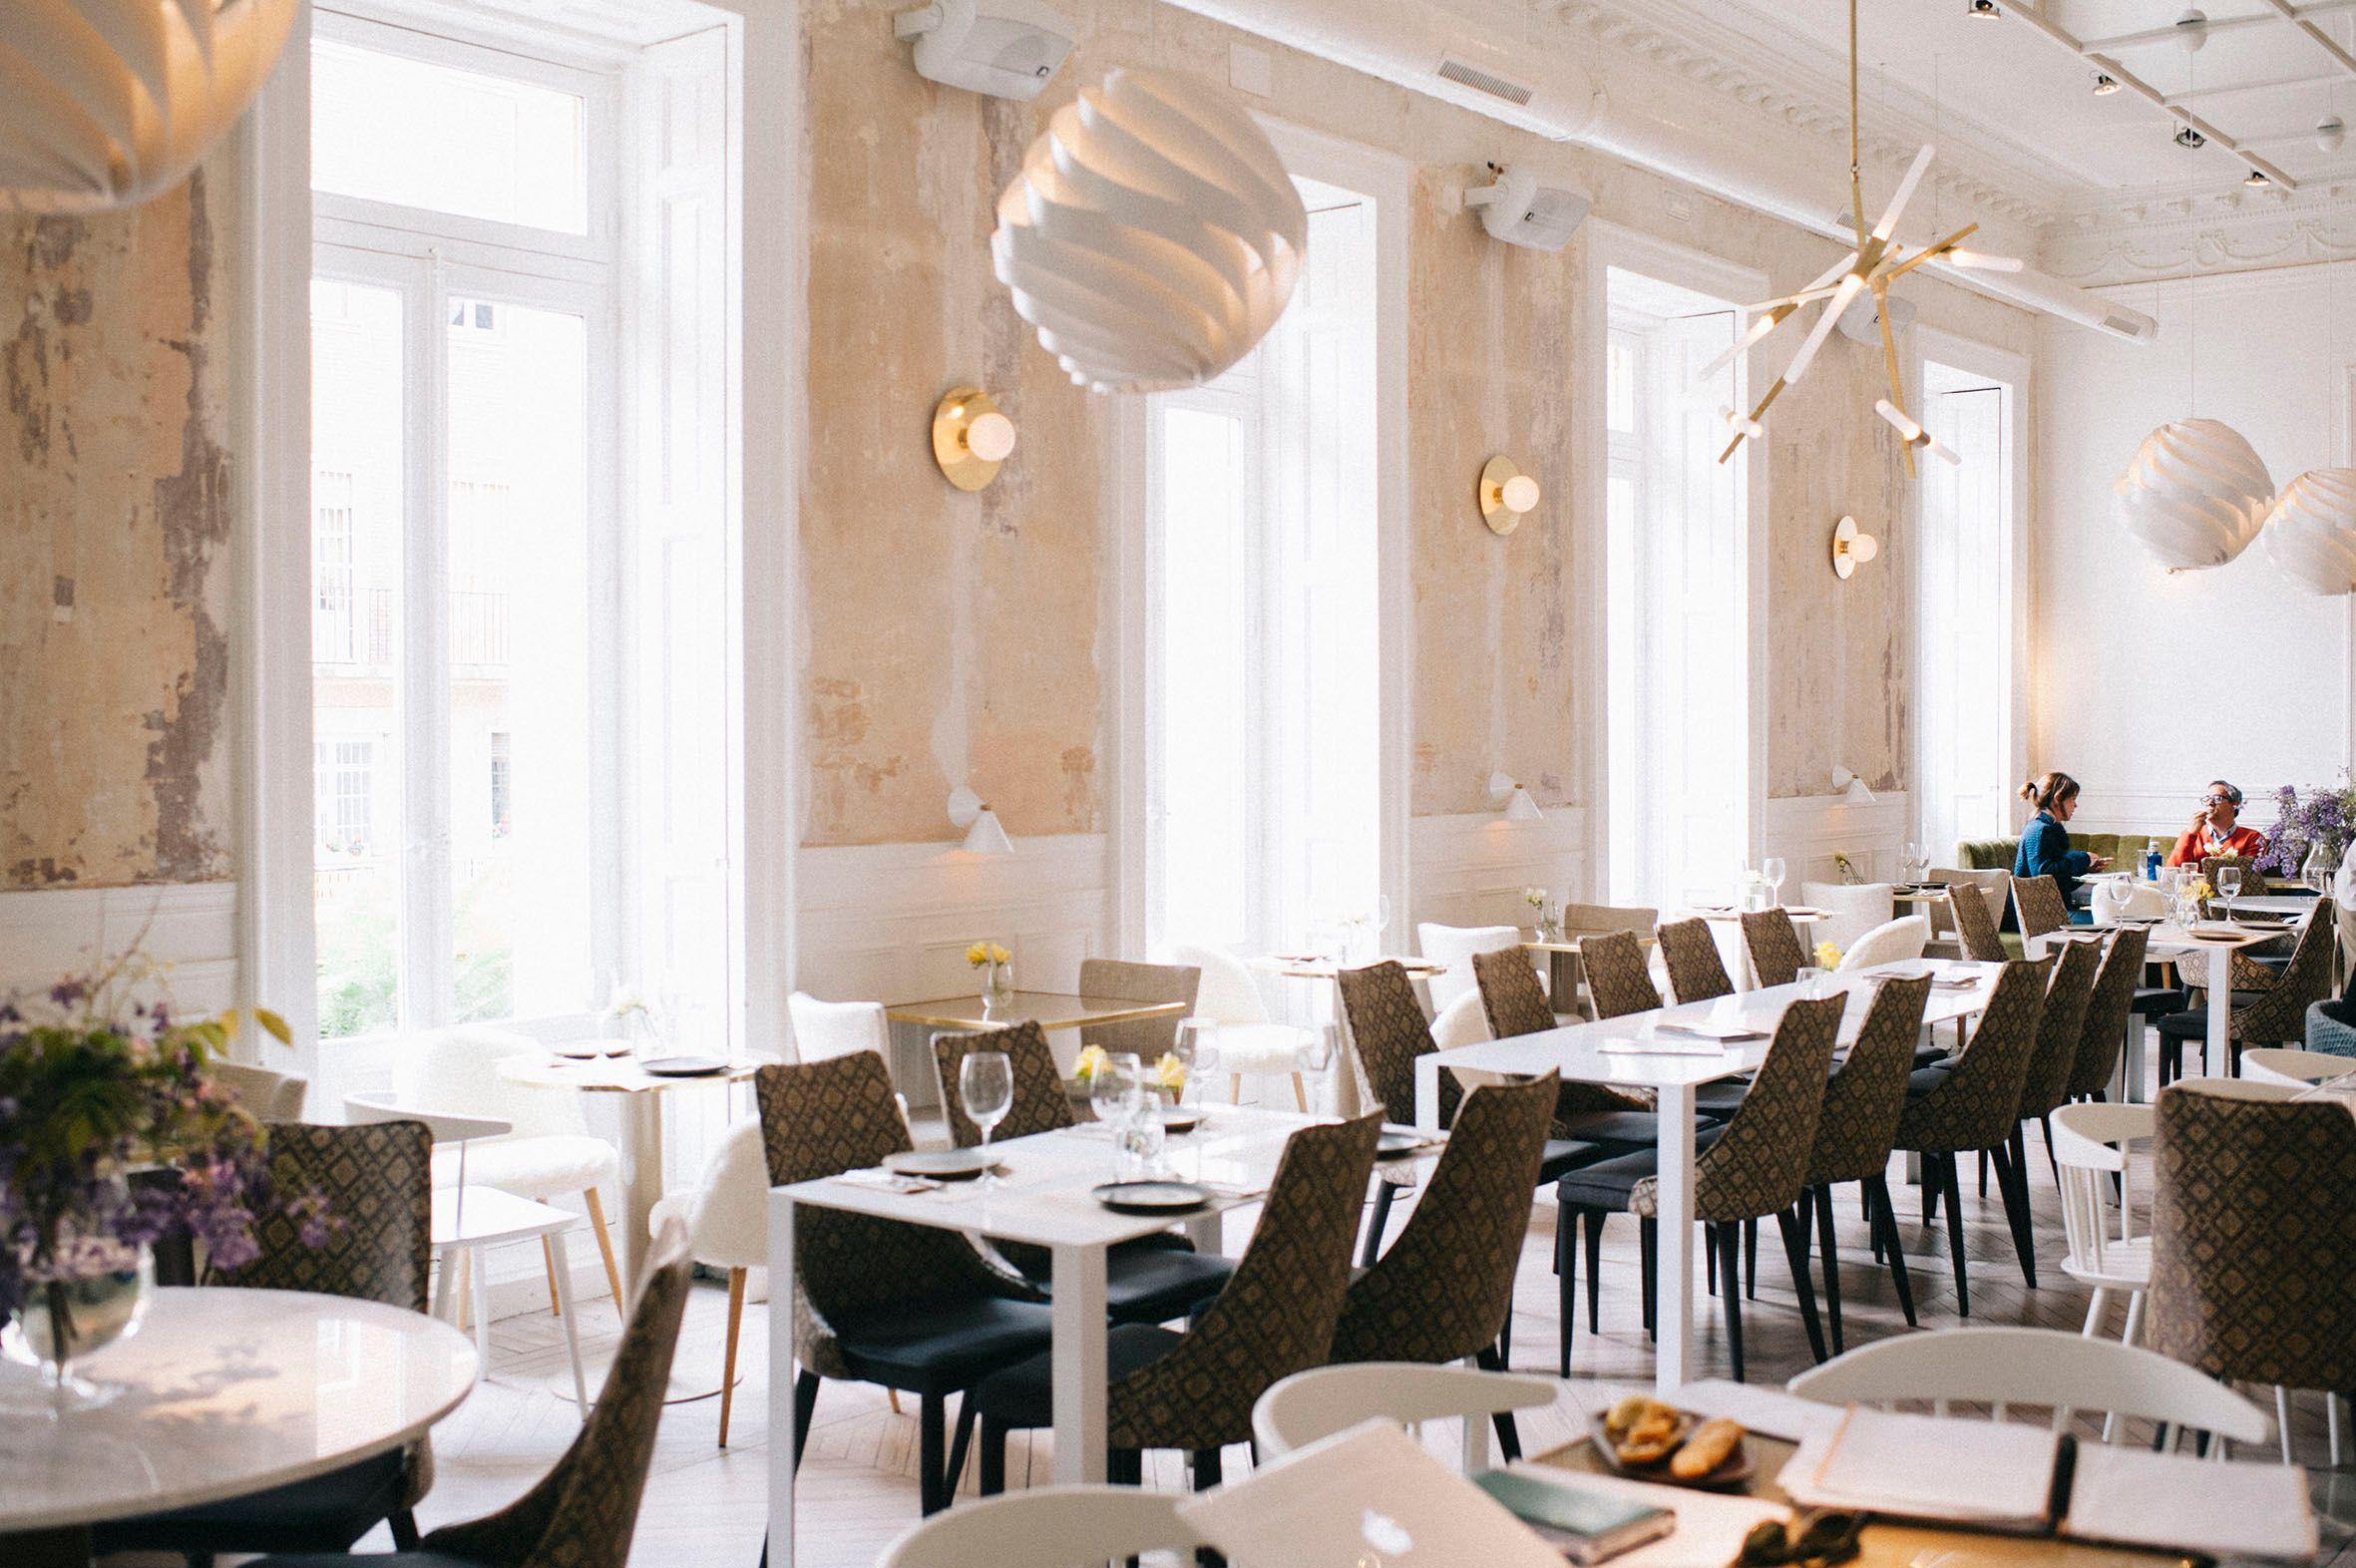 El Imparcial Restaurant In Madrid Restaurants Cafes Bars  ~ Planes En Madrid Este Fin De Semana